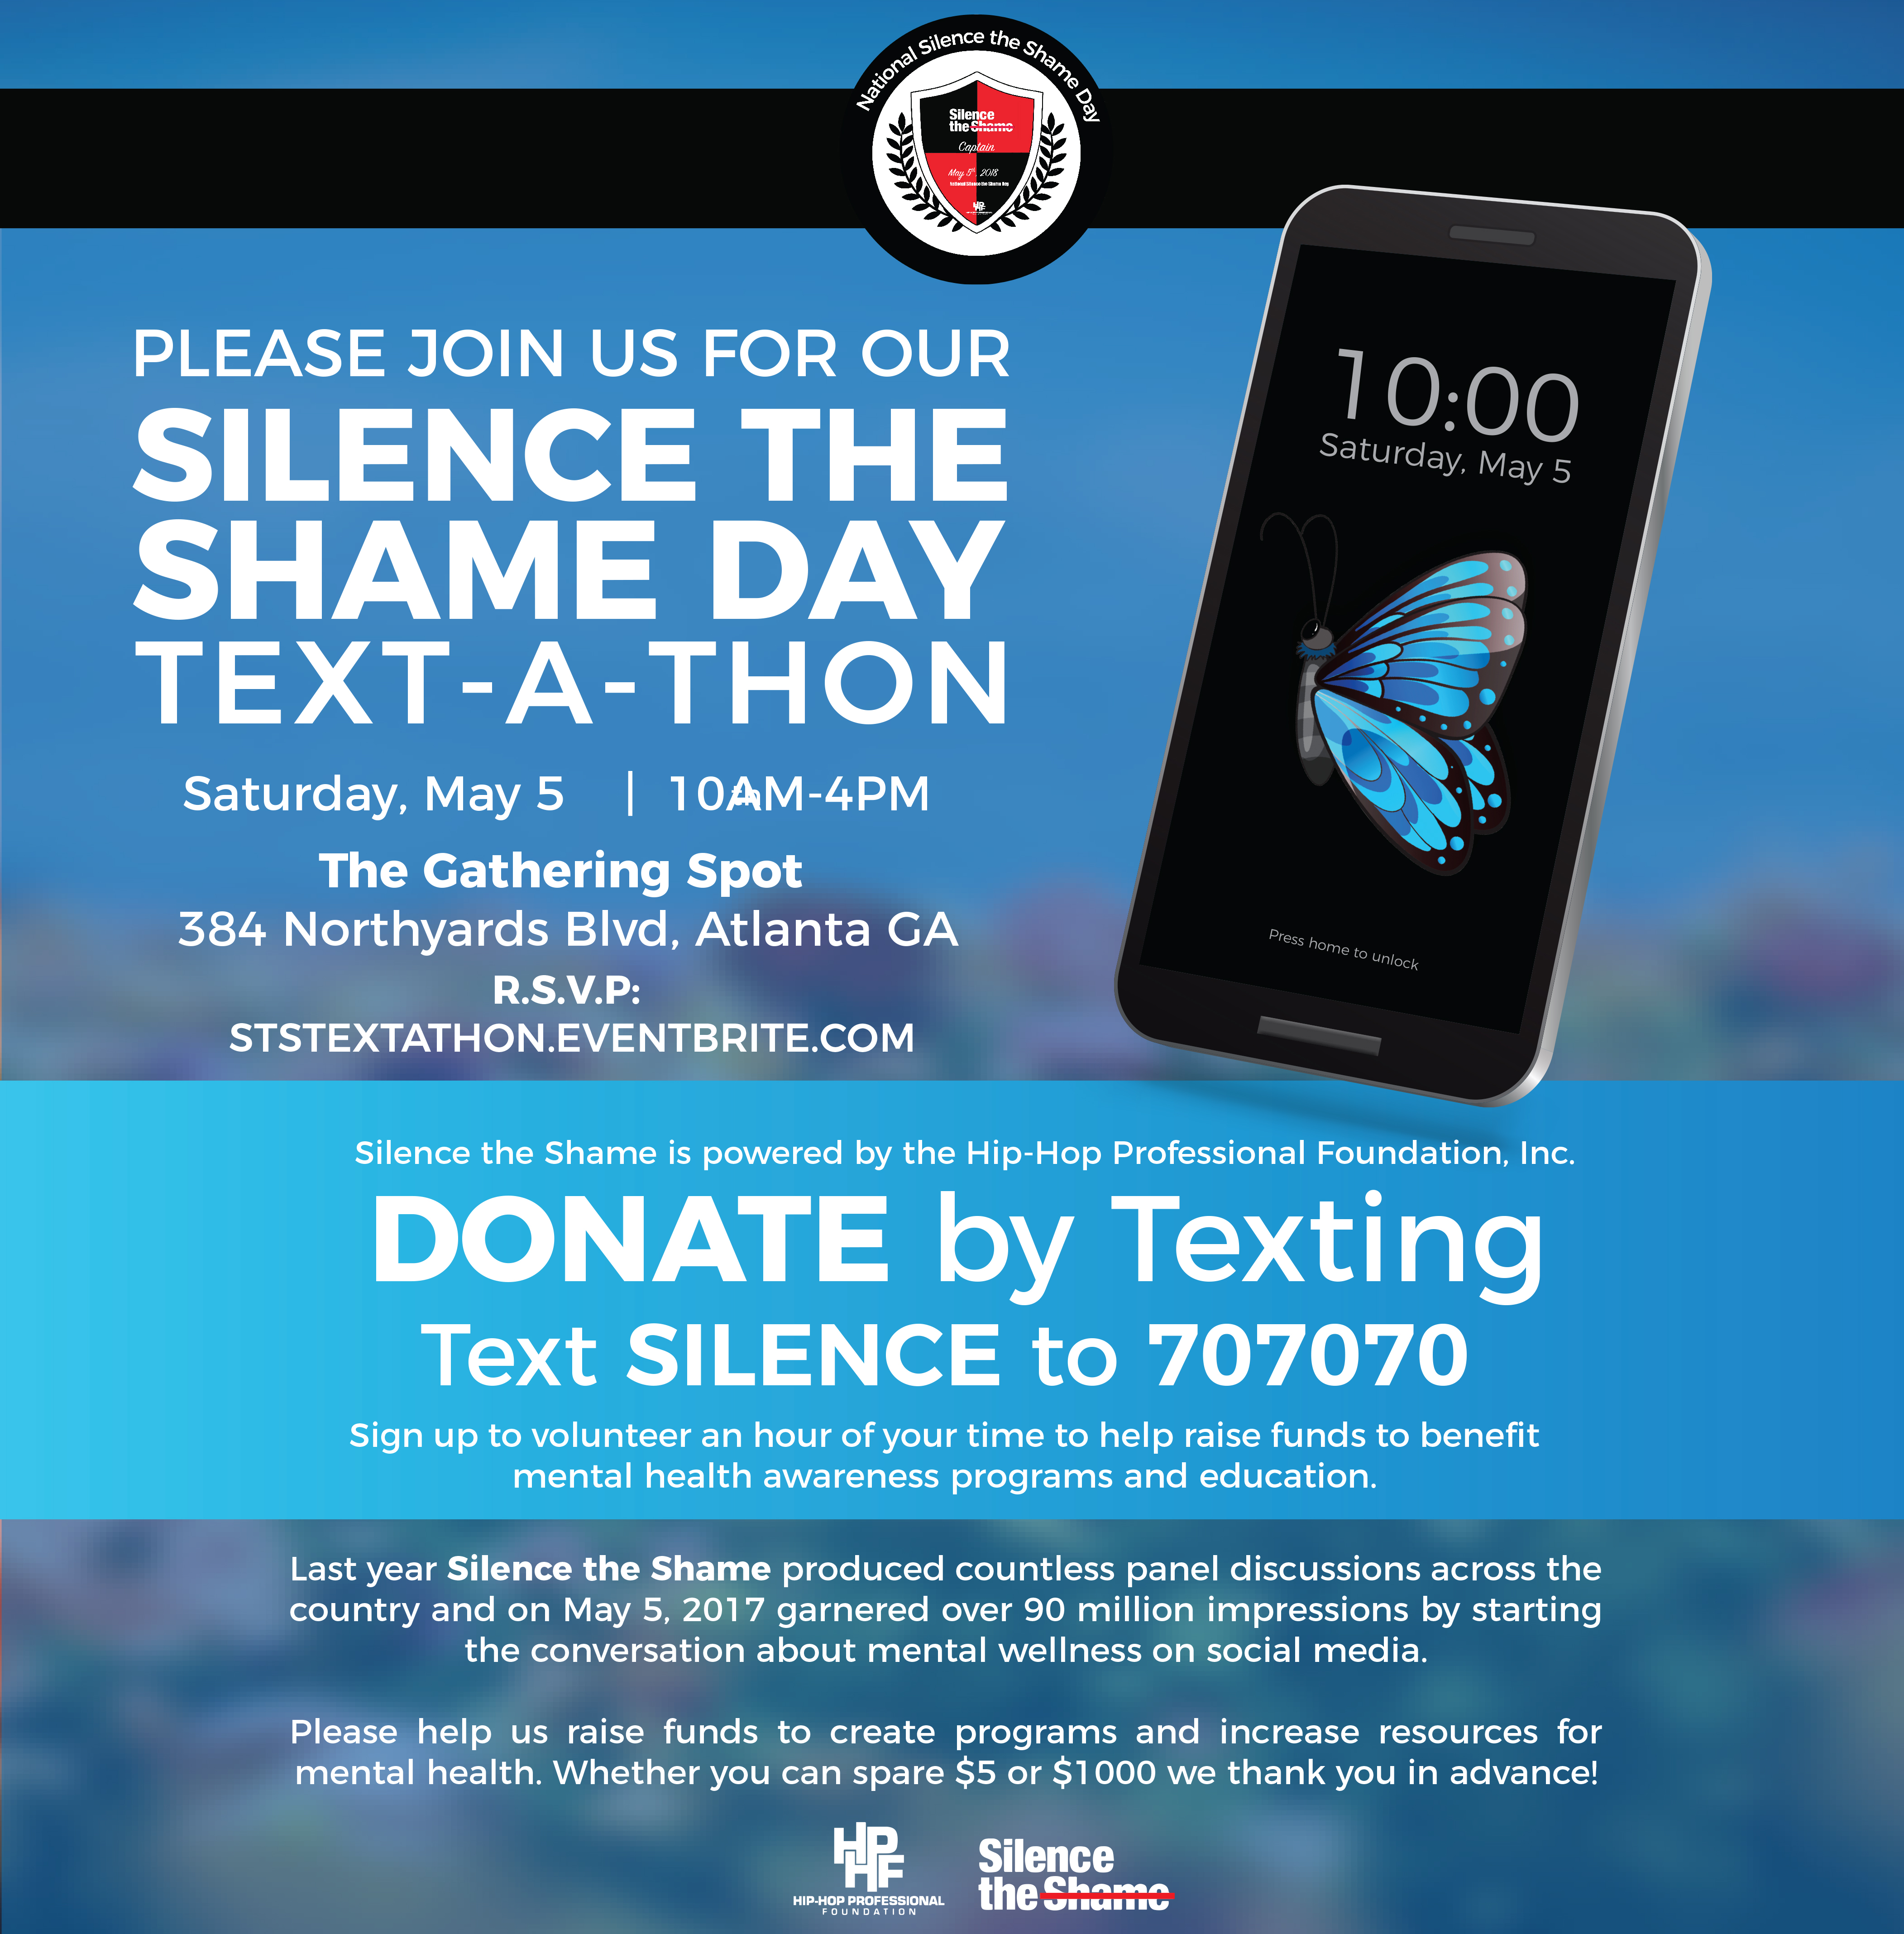 Silence the Shame Text-a-Thon